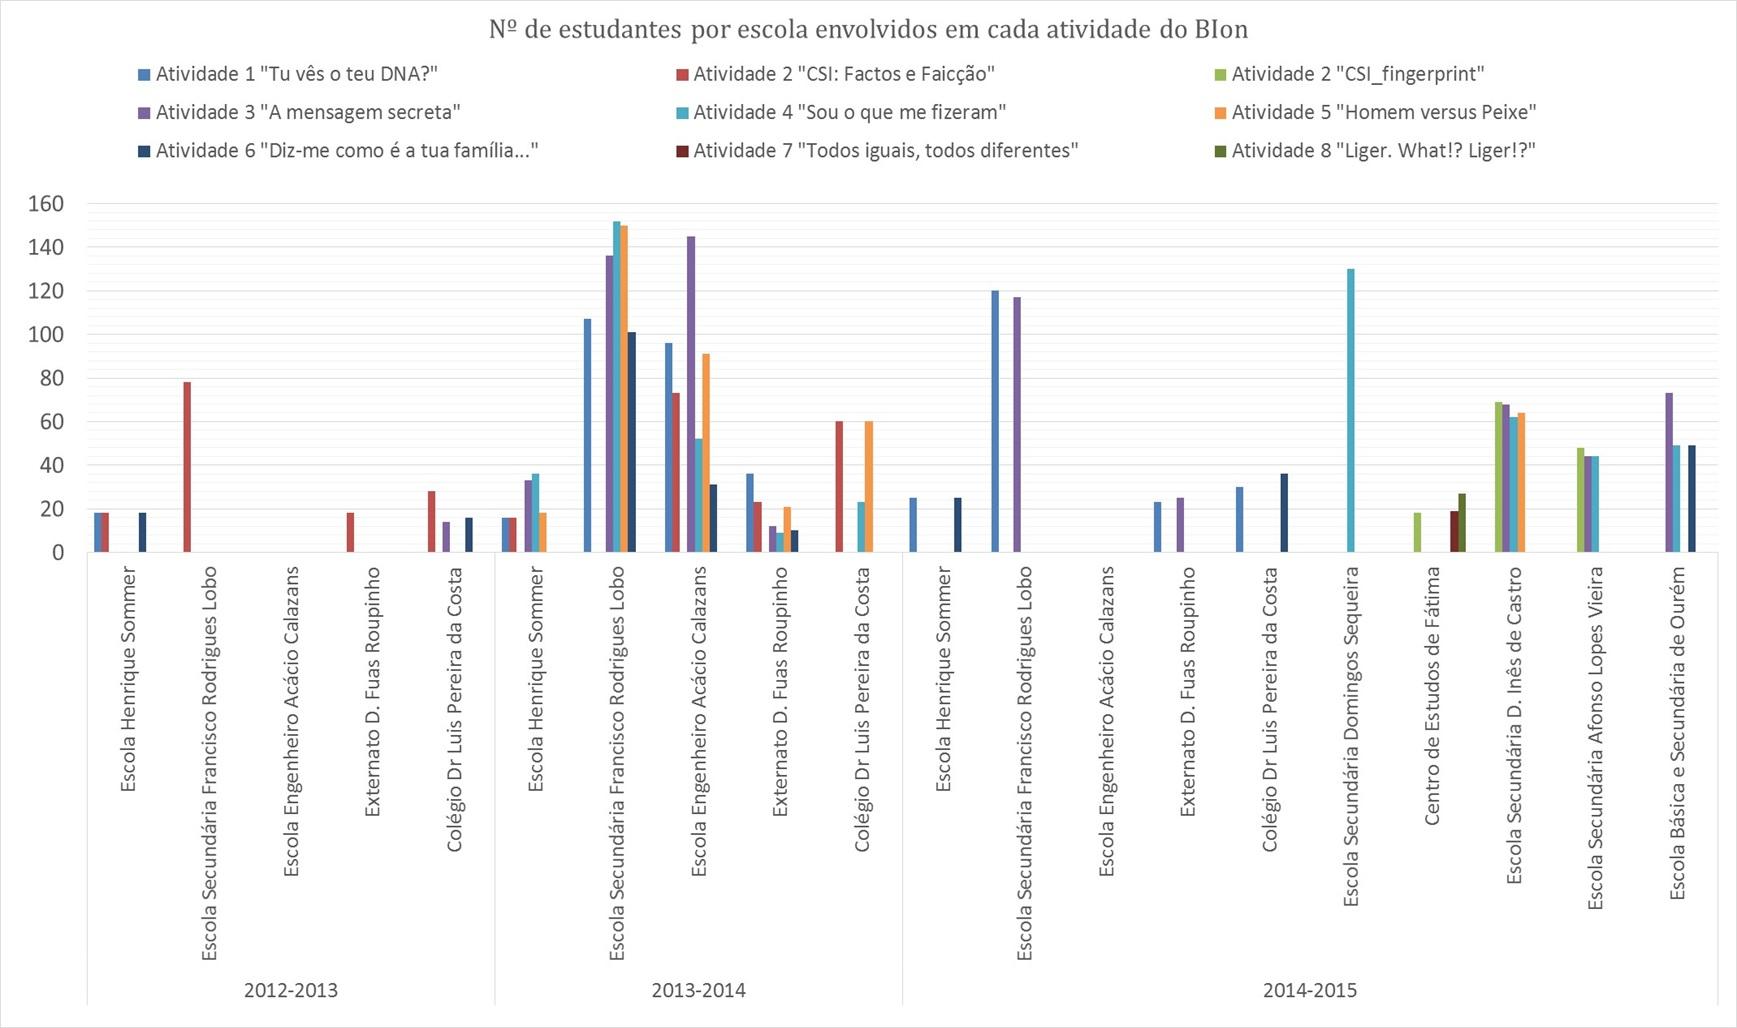 Gráfico Geral das Atvidade BIon2014